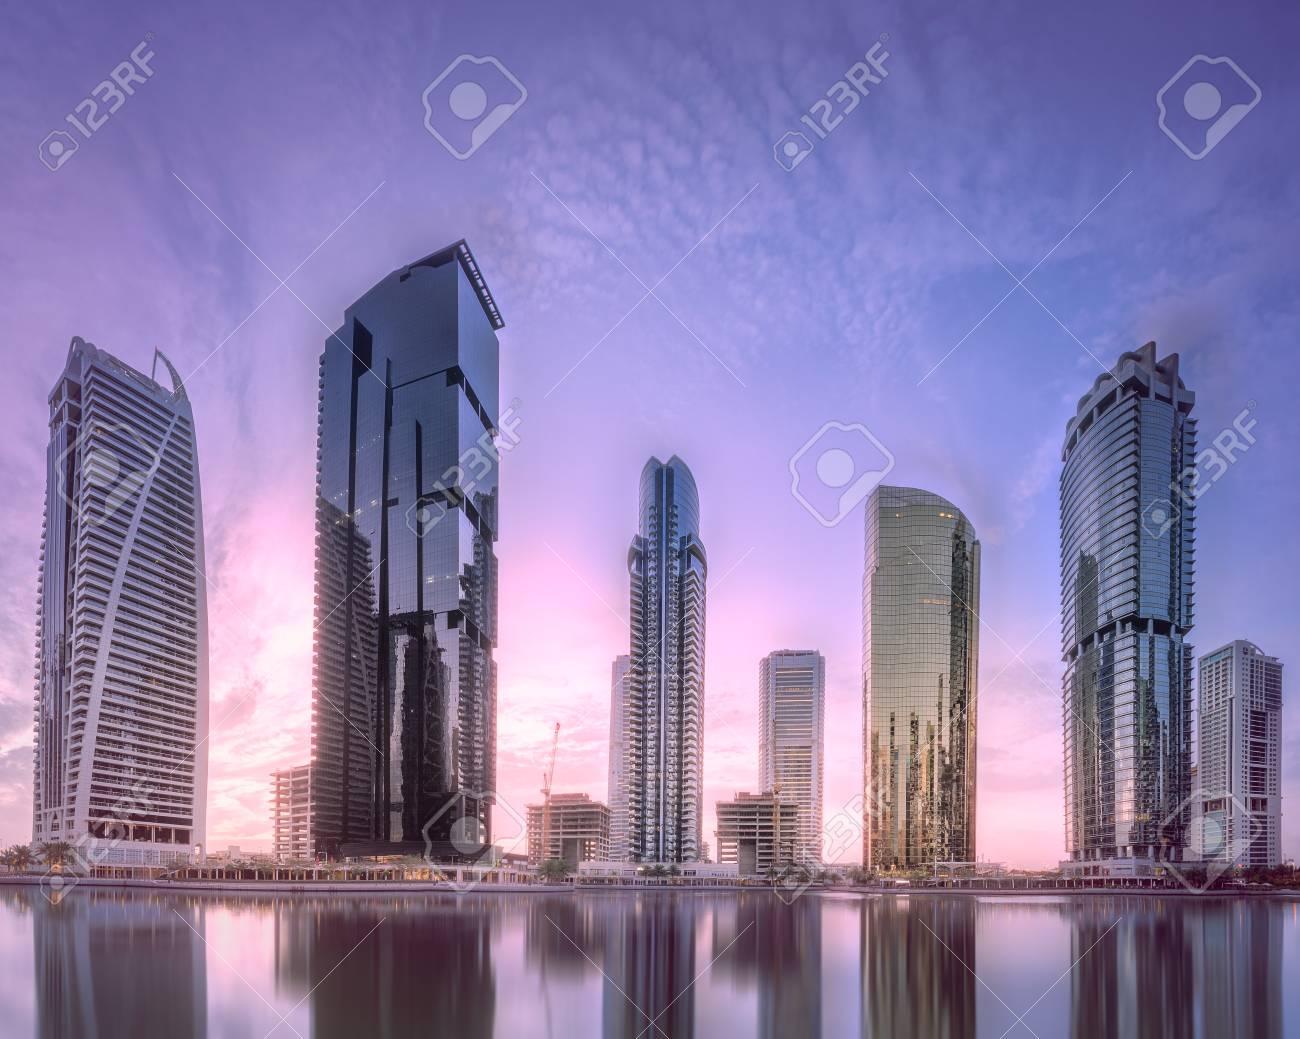 Jumeirah Lakes Towers in Dubai at purple sunrise - 103048896